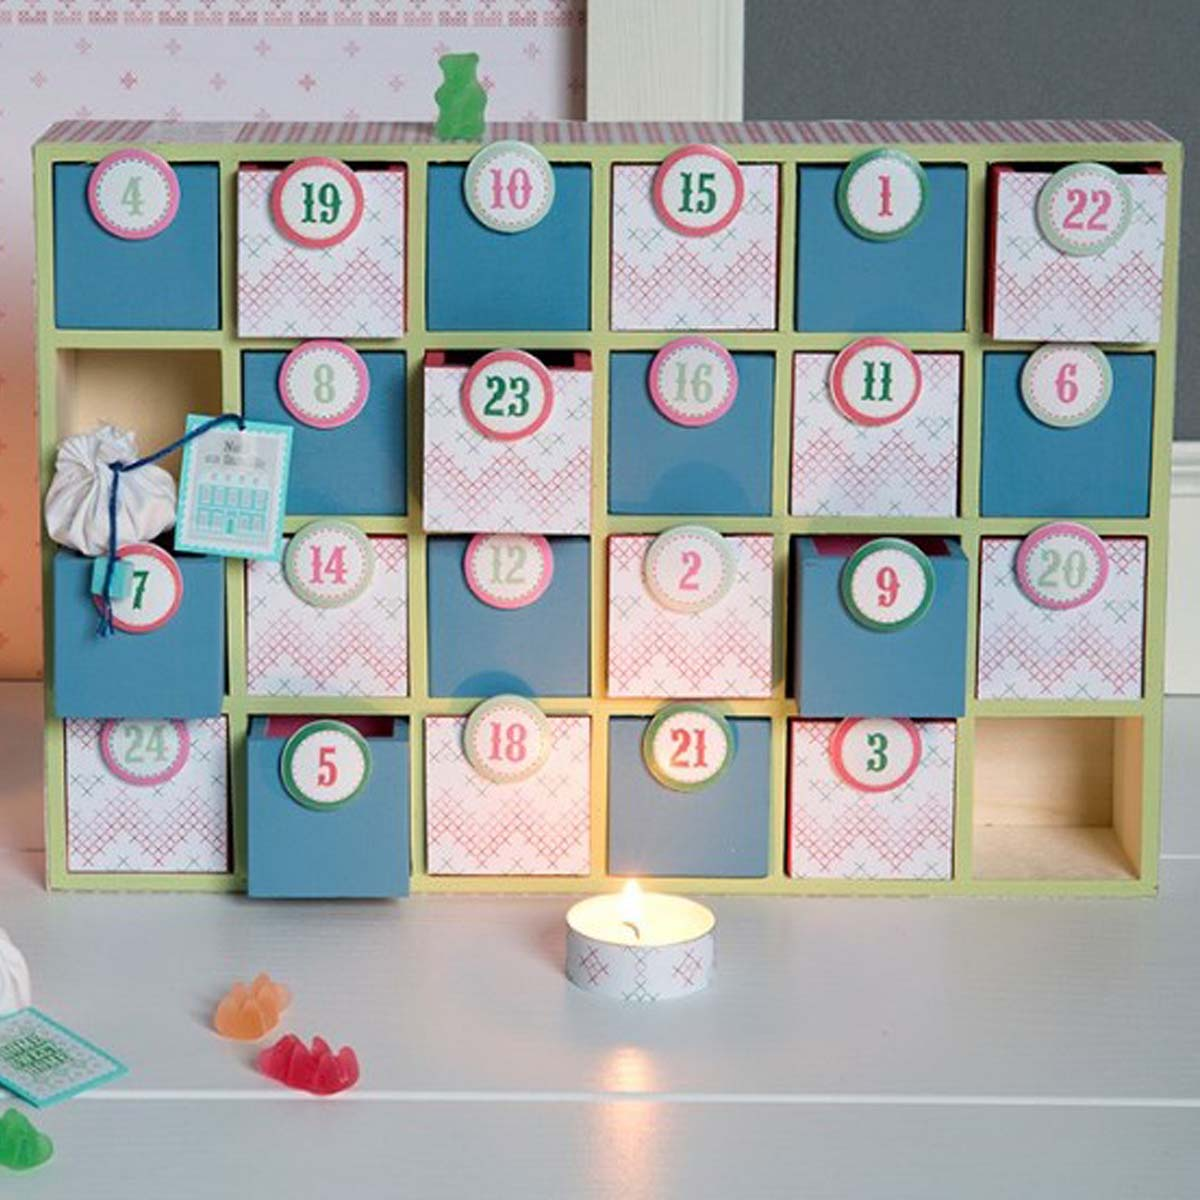 24 Petits Jouets Garçons (6 à 9,5 cm maxi) Calendrier de l'Avent